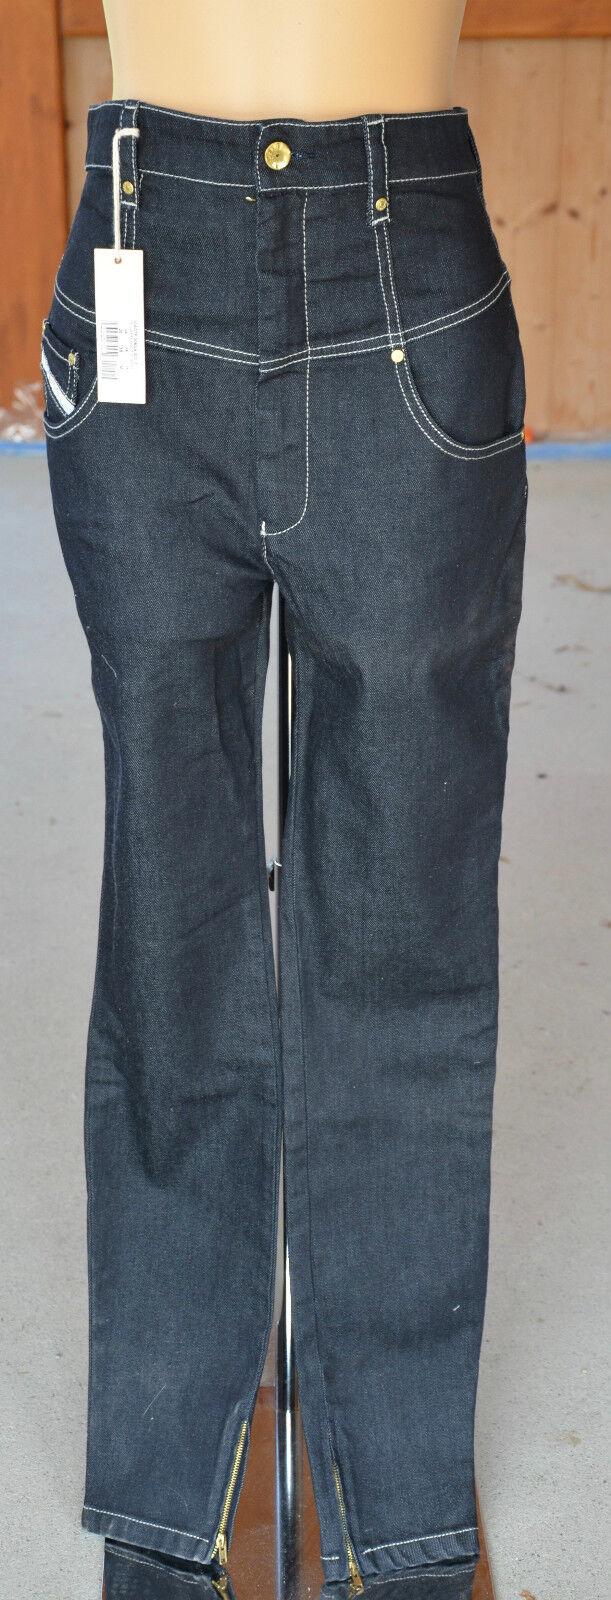 DIESEL -Très joli jeans caredte - size W28 - F 38- NEUF